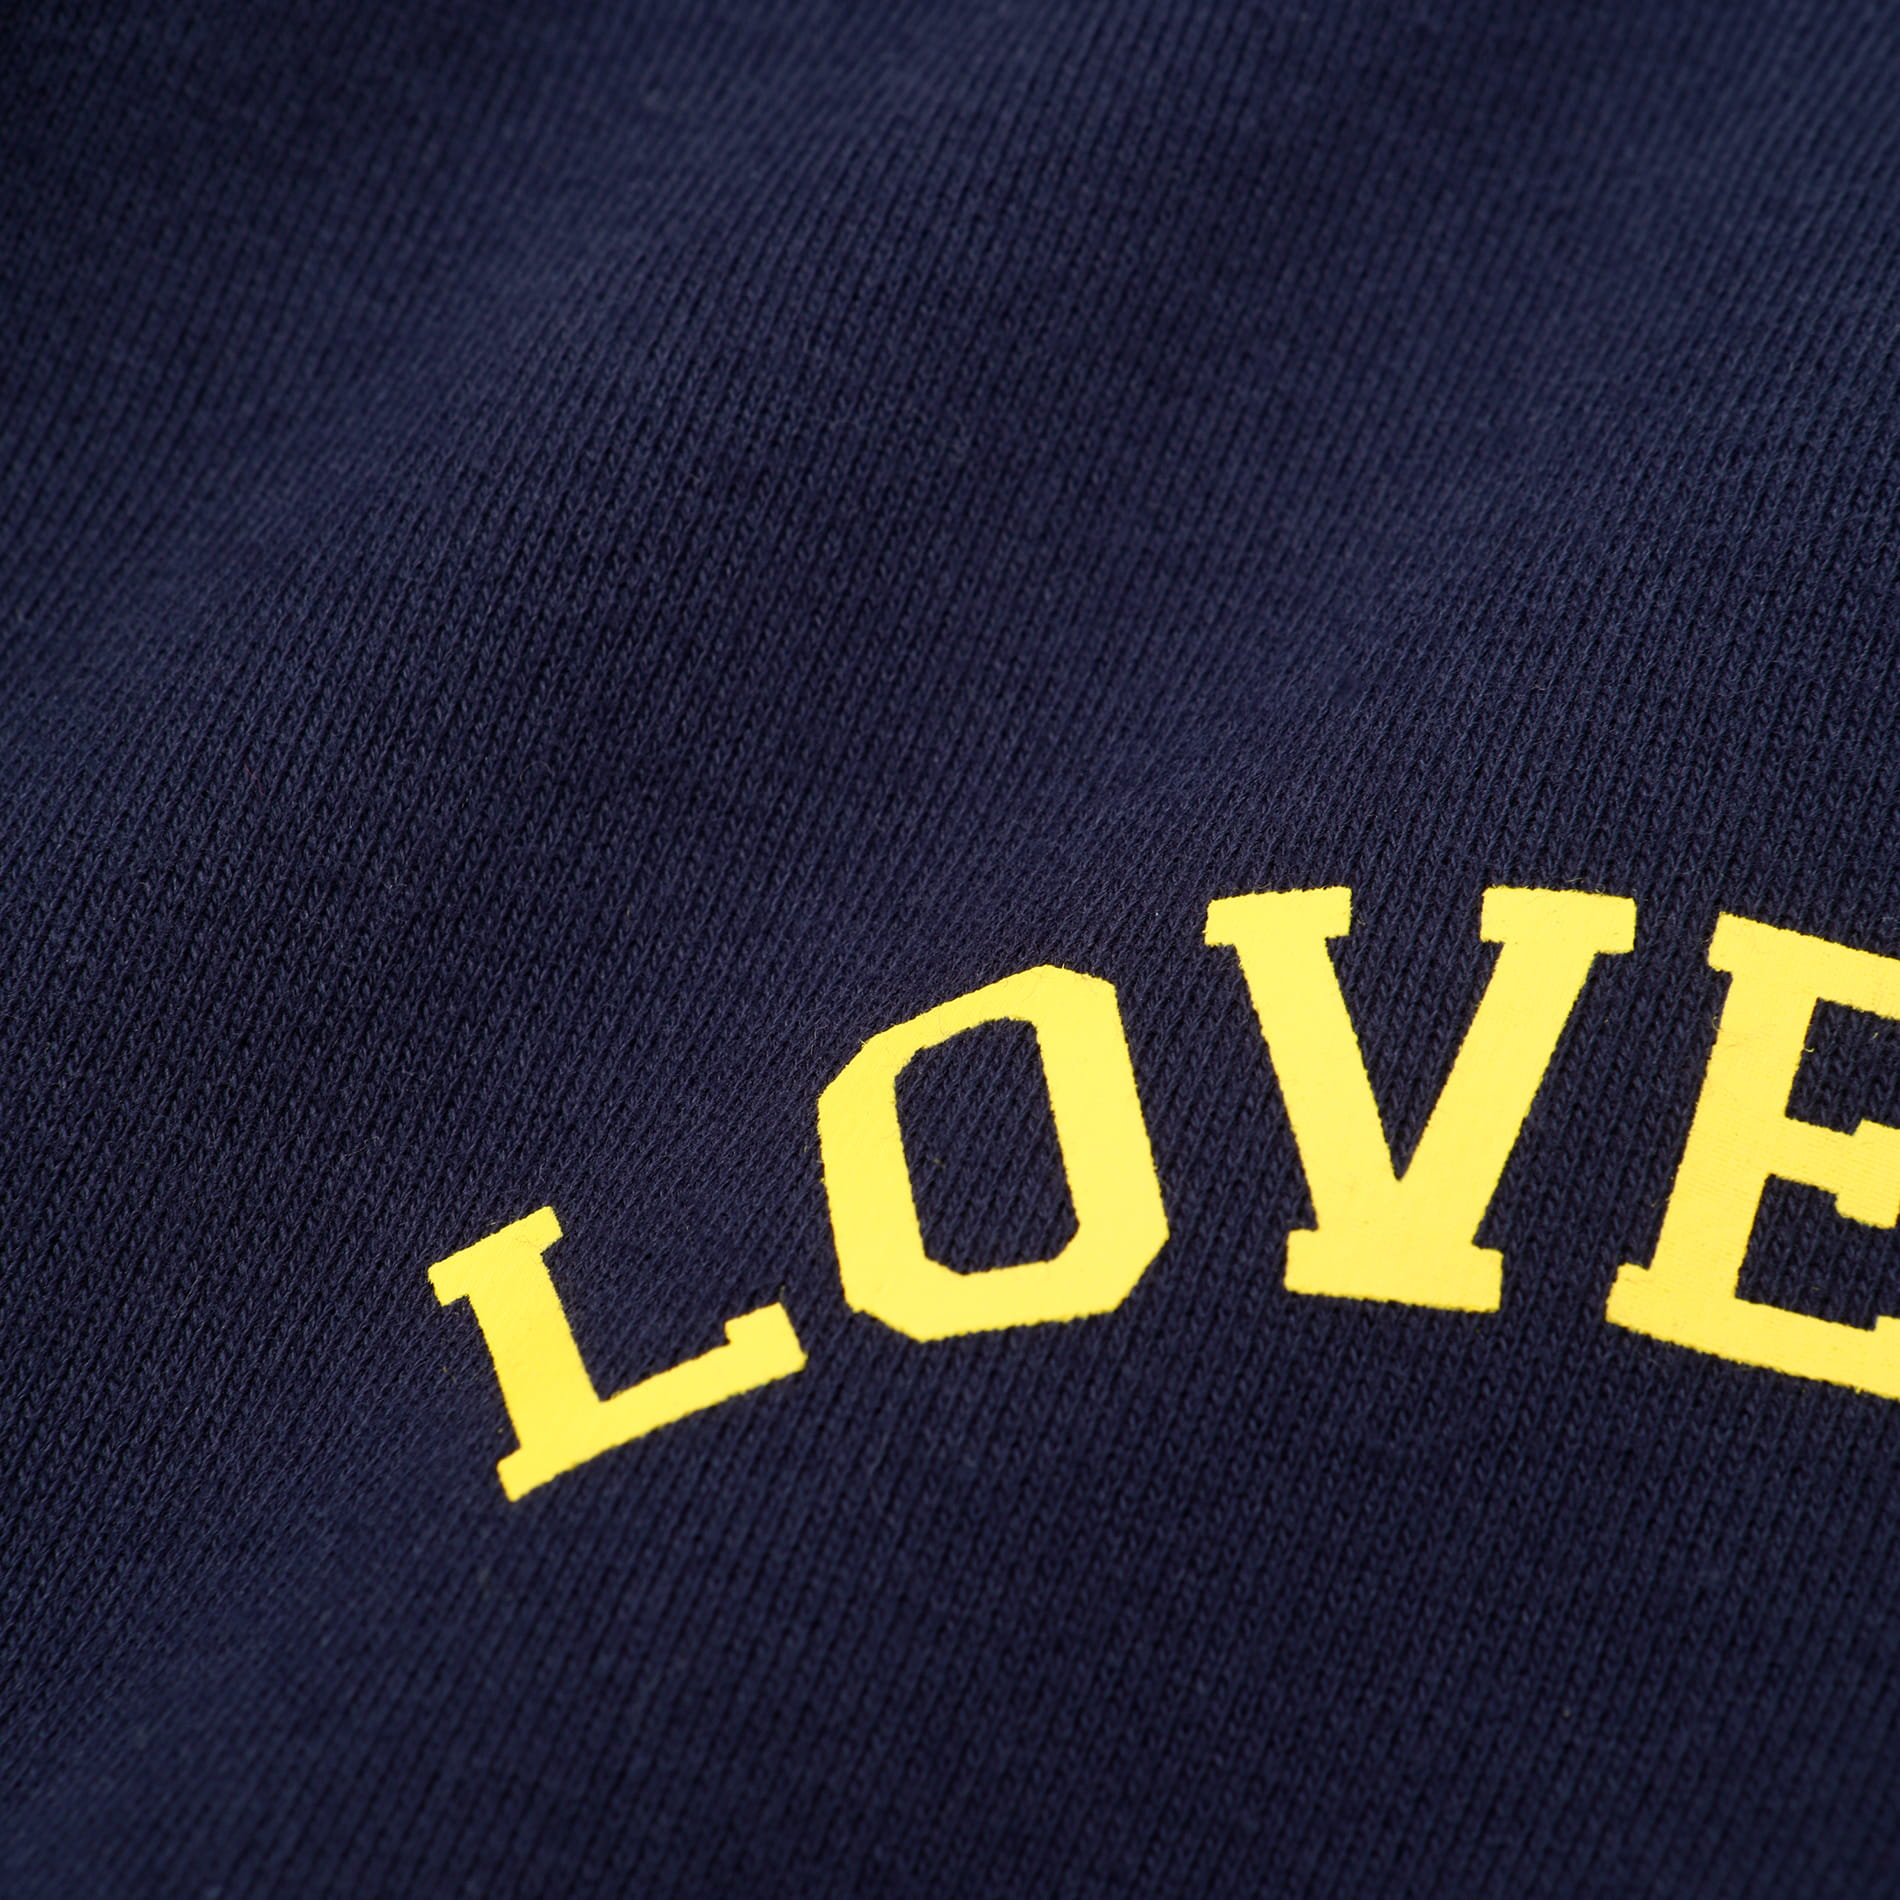 Safari LOVELESSカレッジロゴ スウェットパンツ